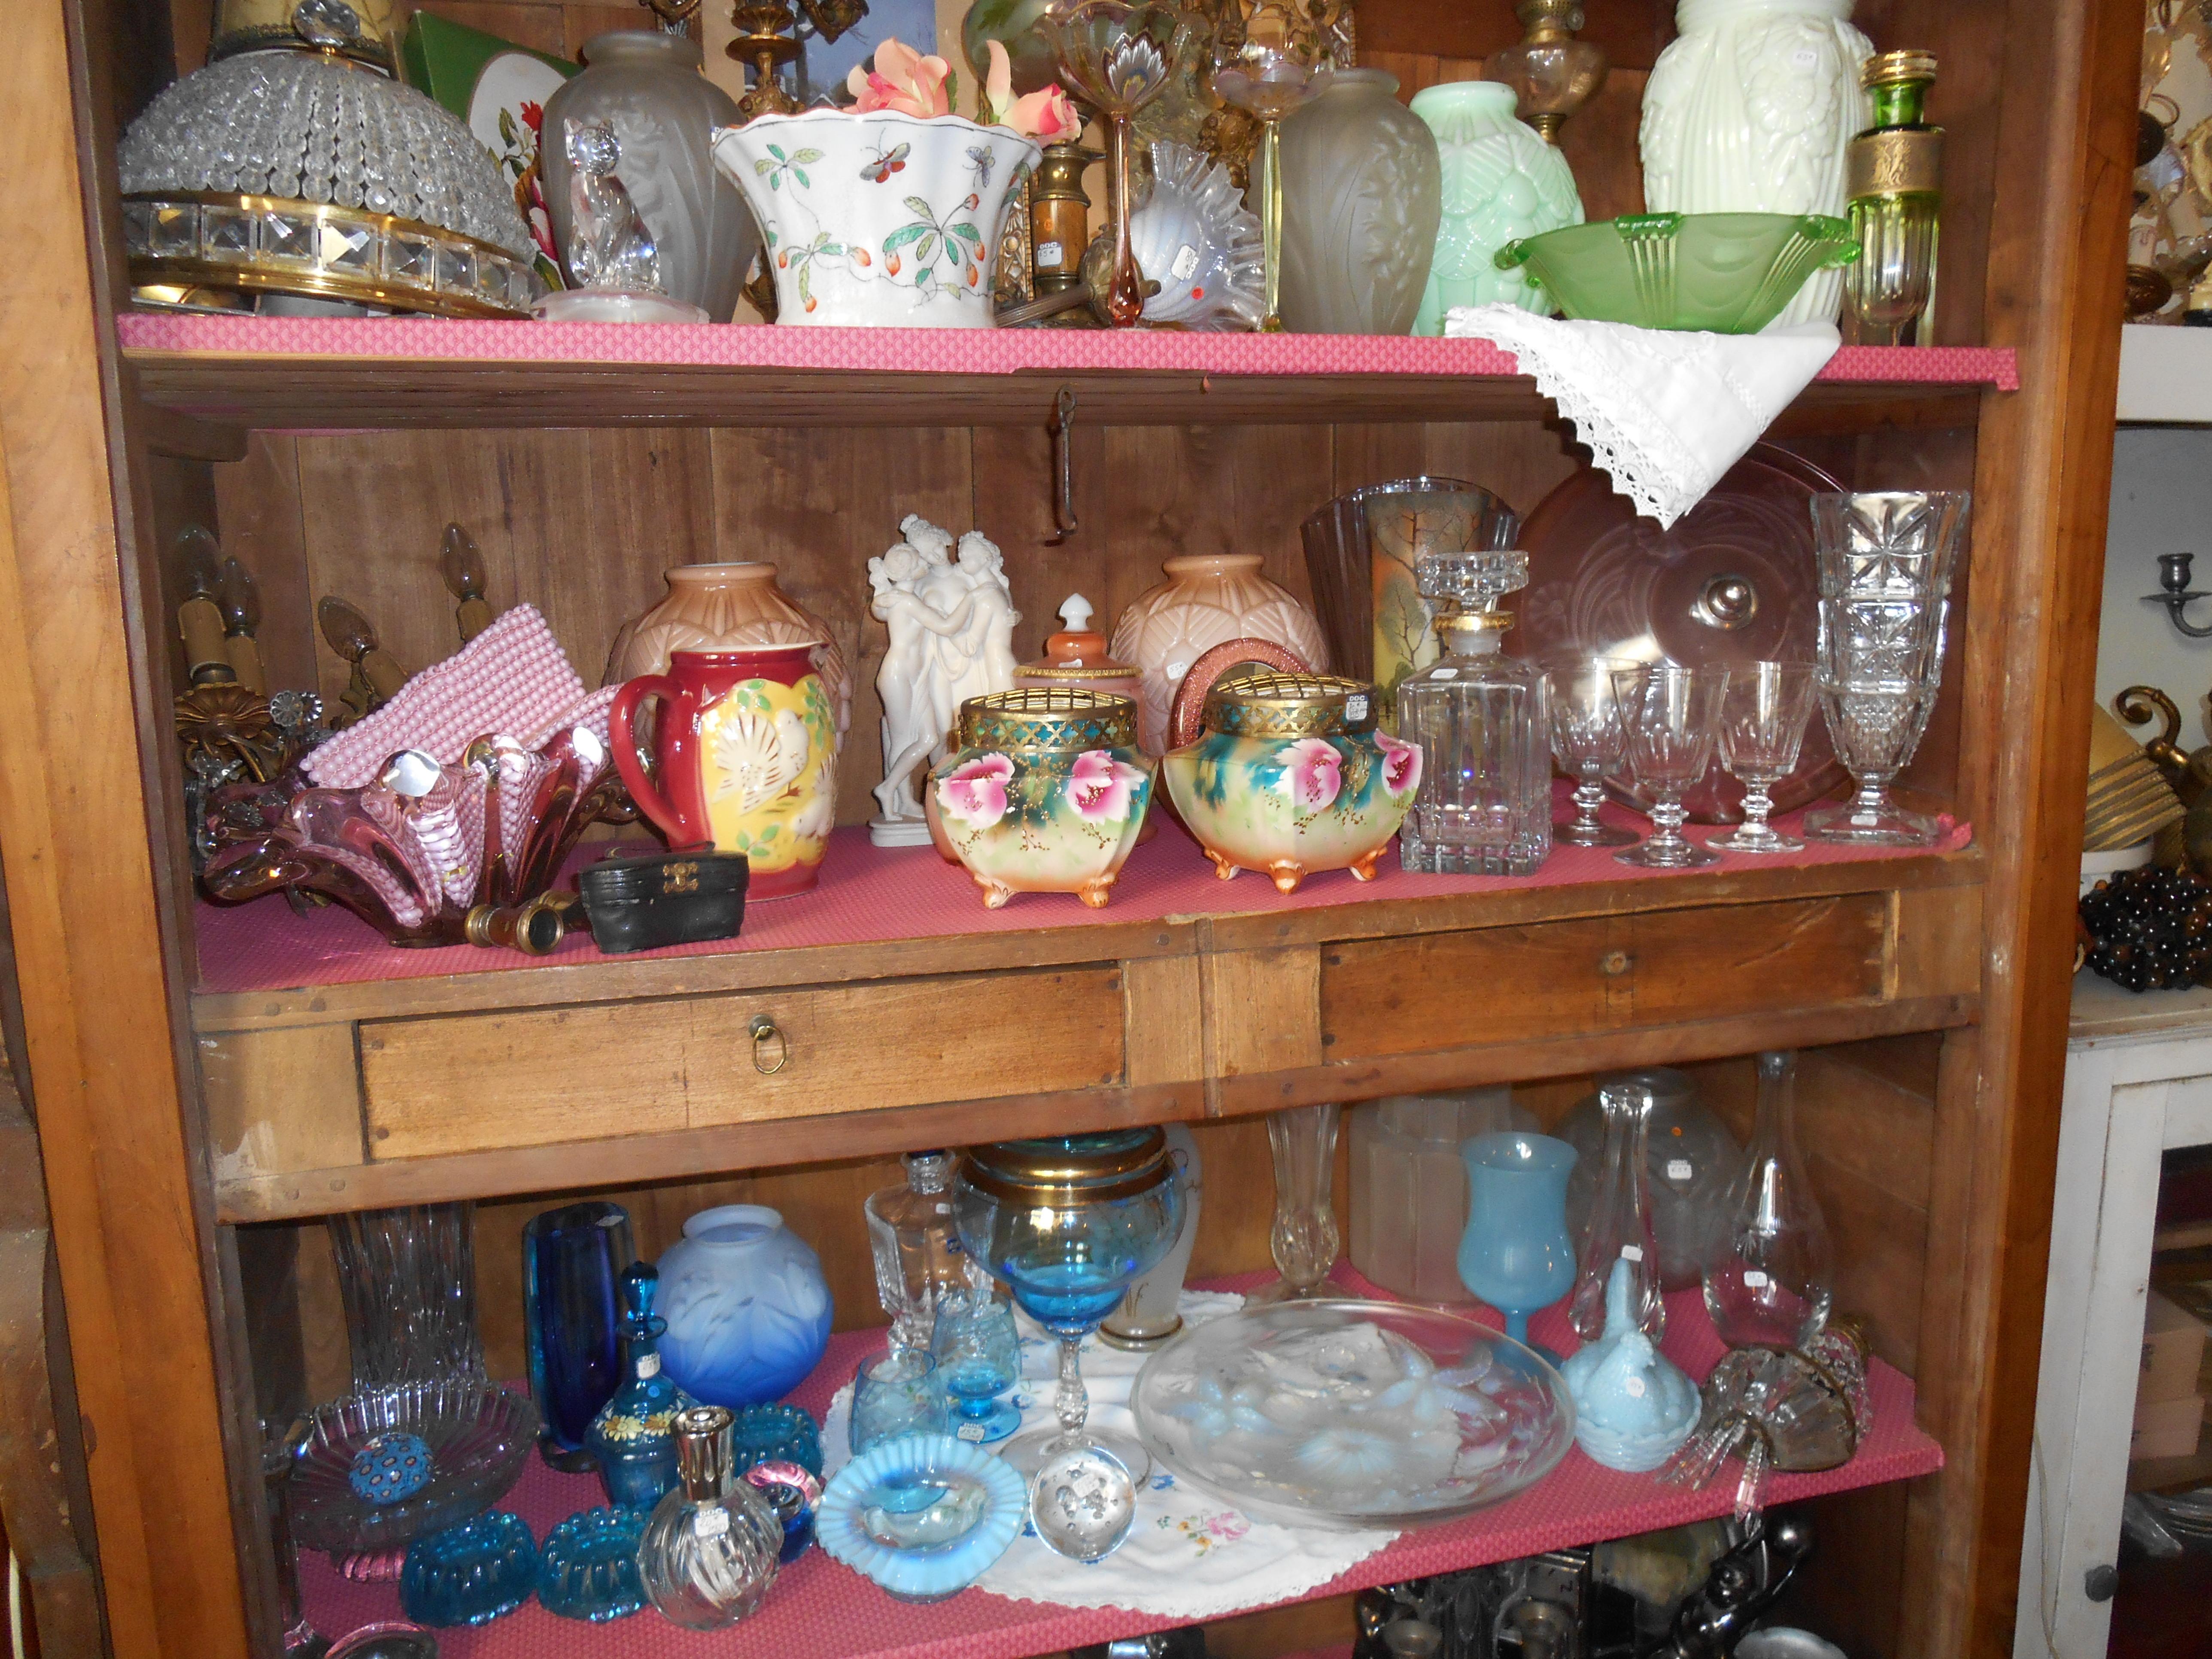 Galerie d'image - L'atelier vintage brocante marmande